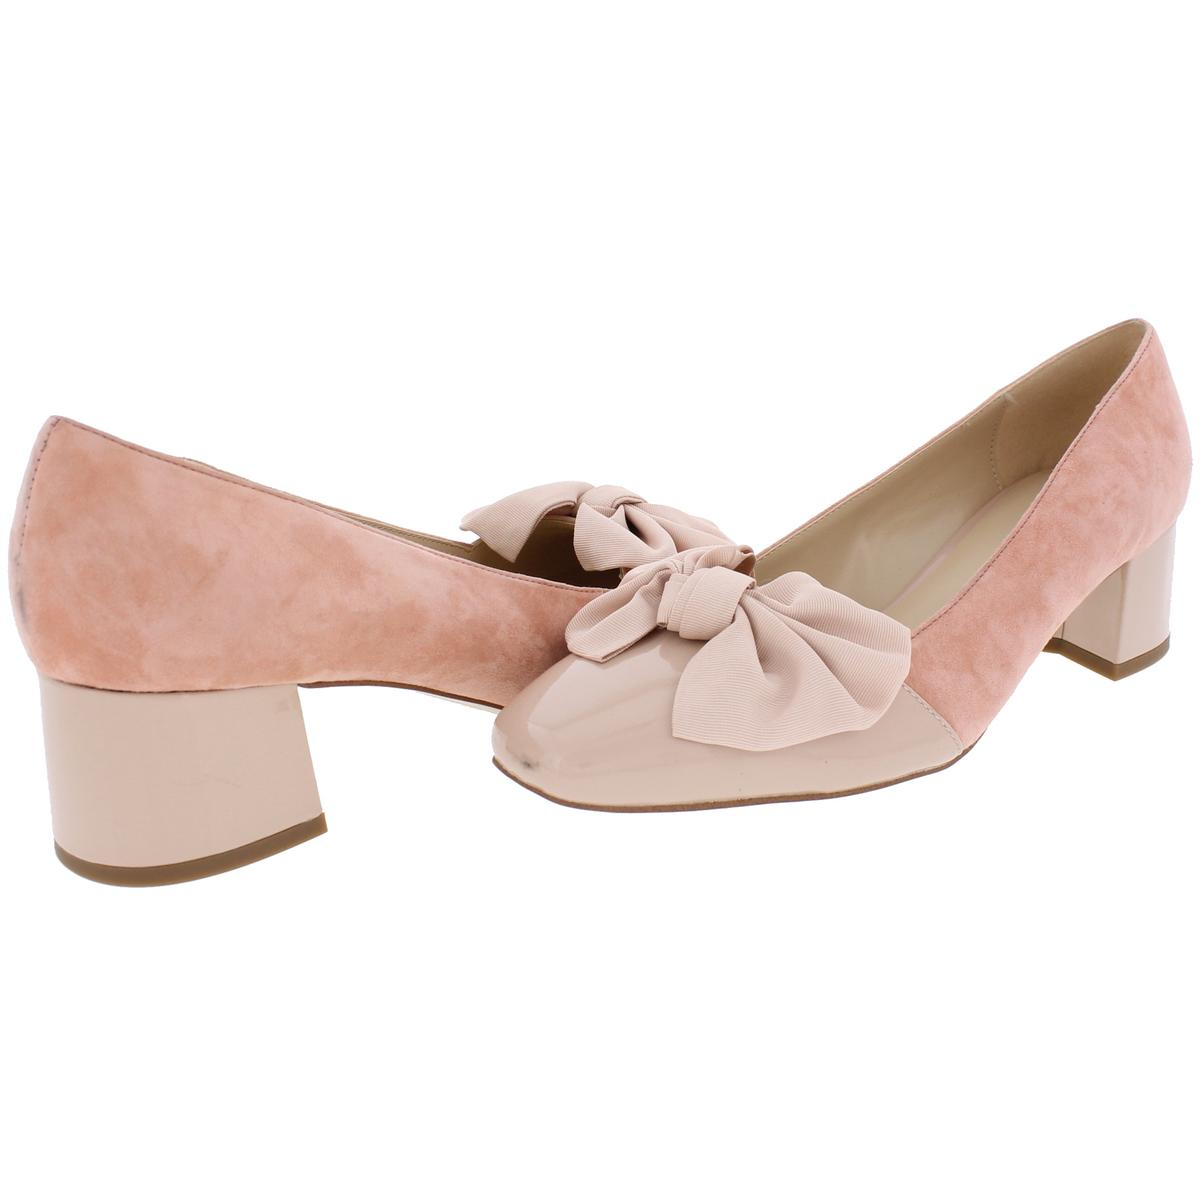 IMNYC-Isaac-Mizrahi-Womens-Julia-Square-Toe-Suede-Dress-Pumps-Shoes-BHFO-2614 thumbnail 6